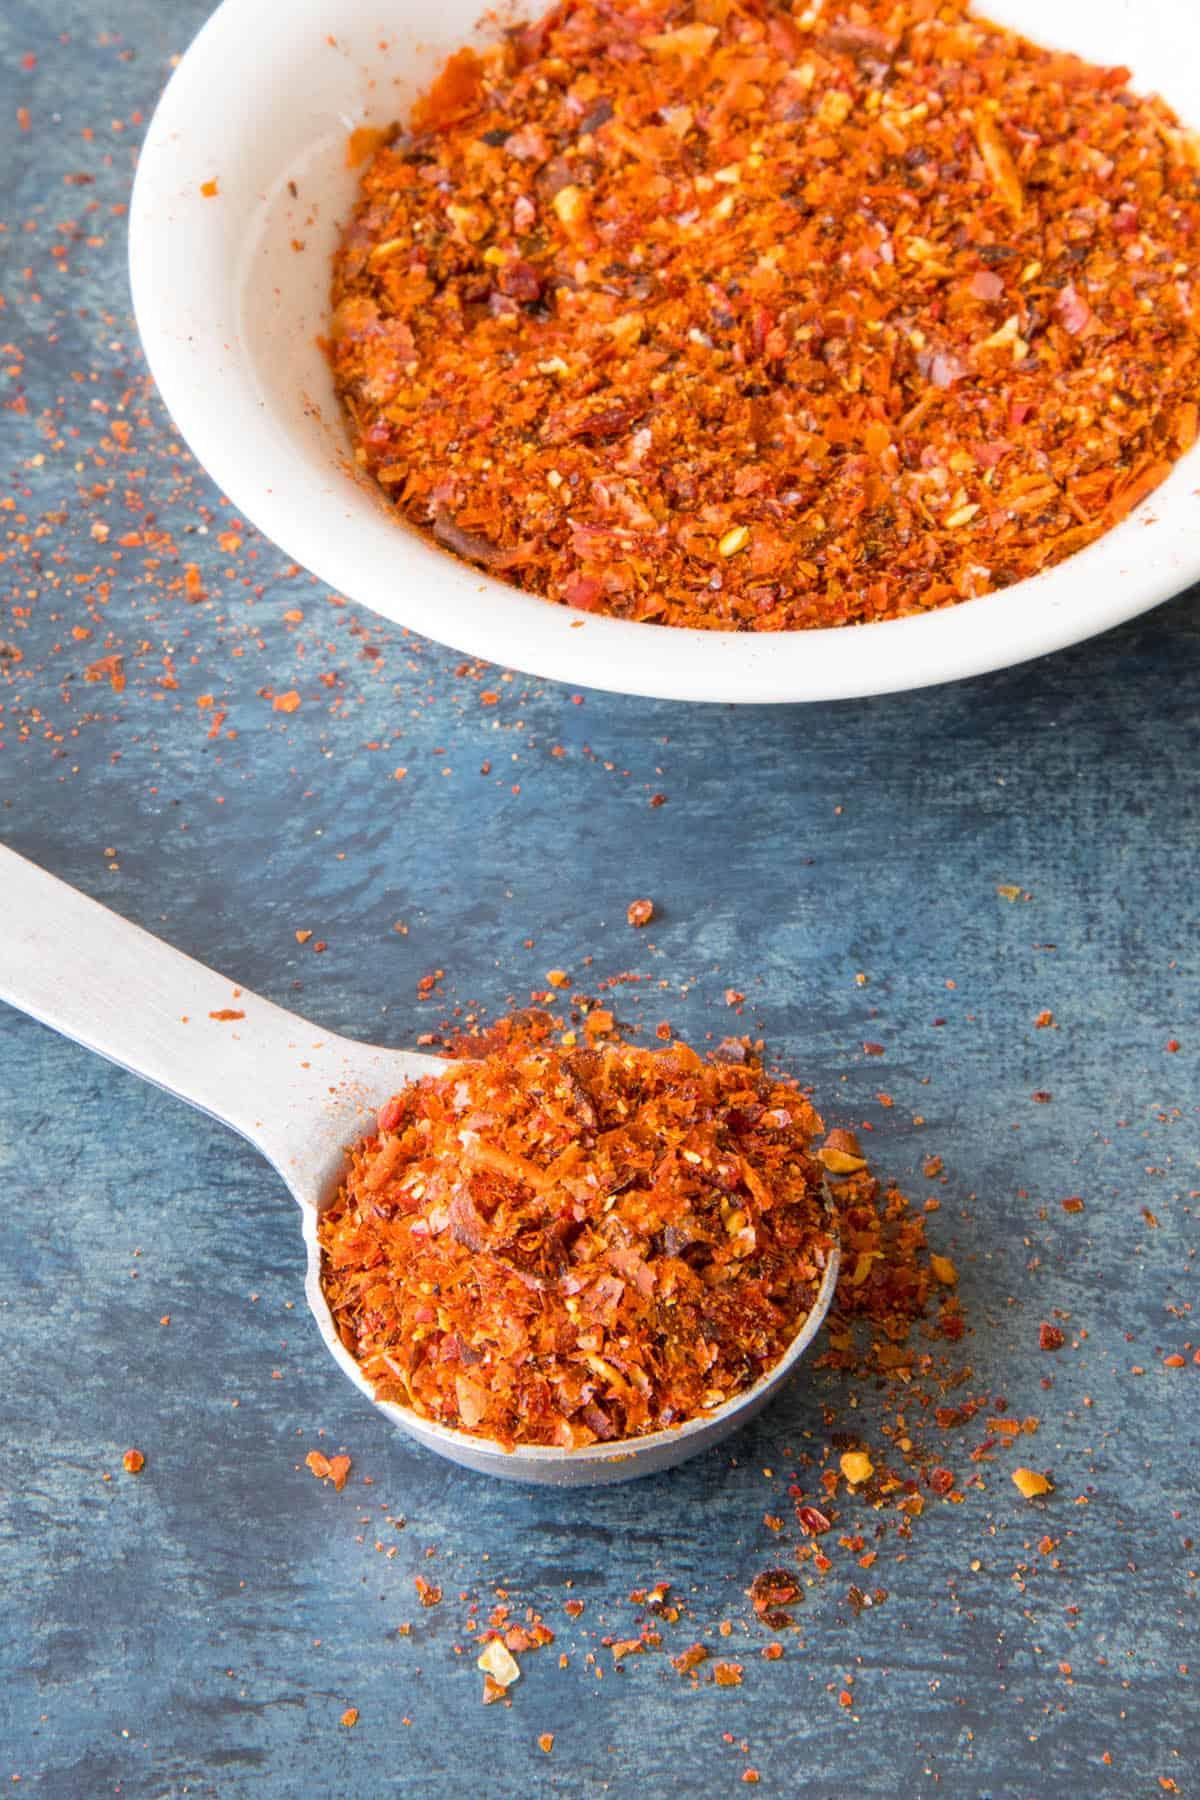 Homemade Roasted Red Jalapeno Chili Powder